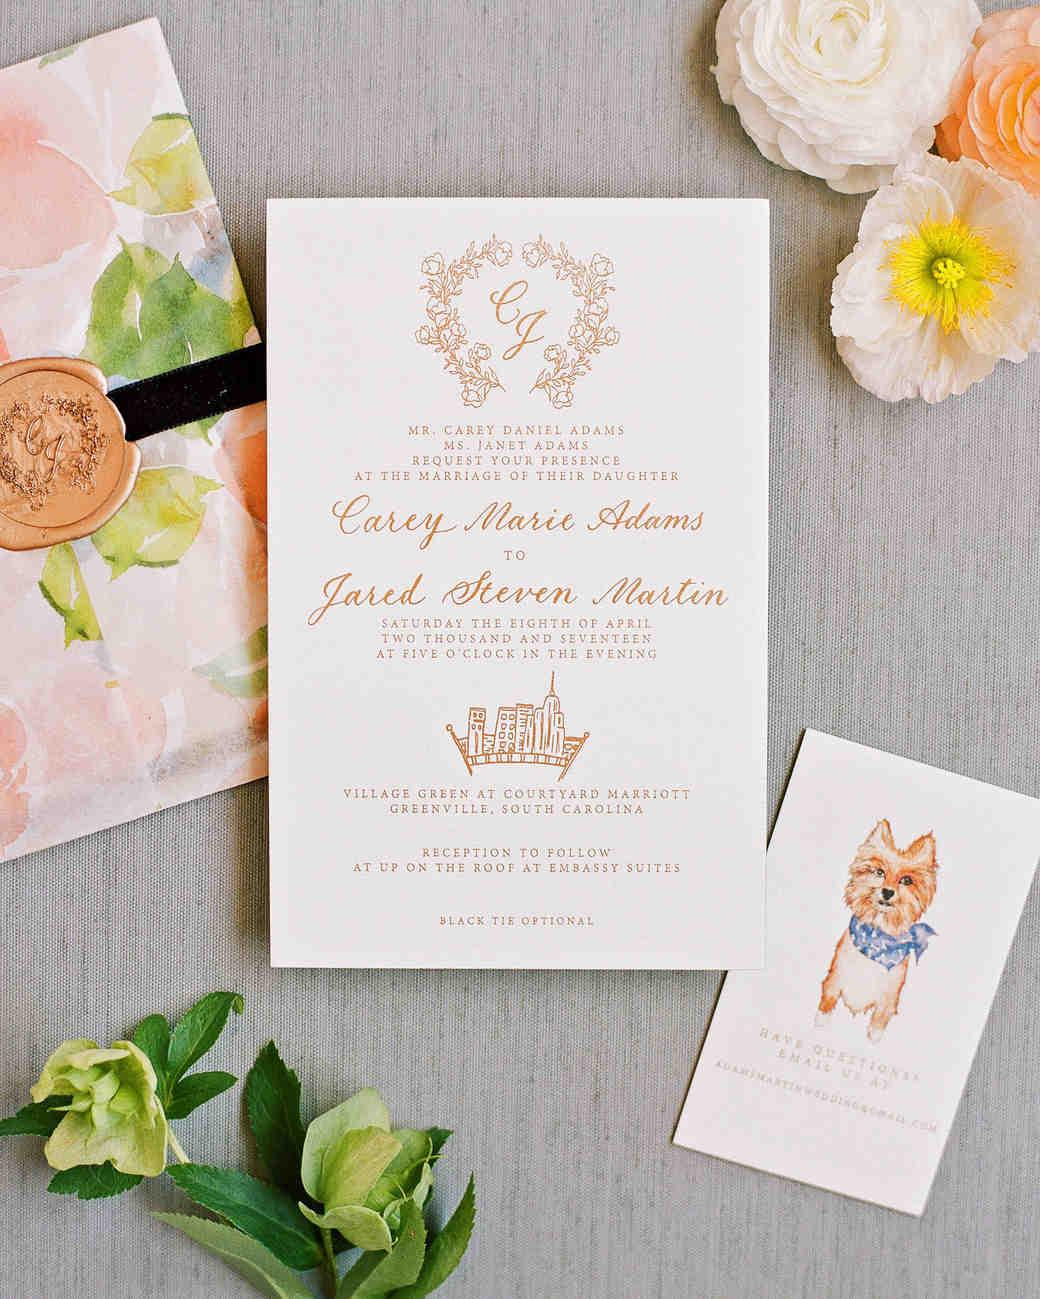 Carey Jared Wedding Invite Formal: Unique Wedding Invitations Spring At Reisefeber.org